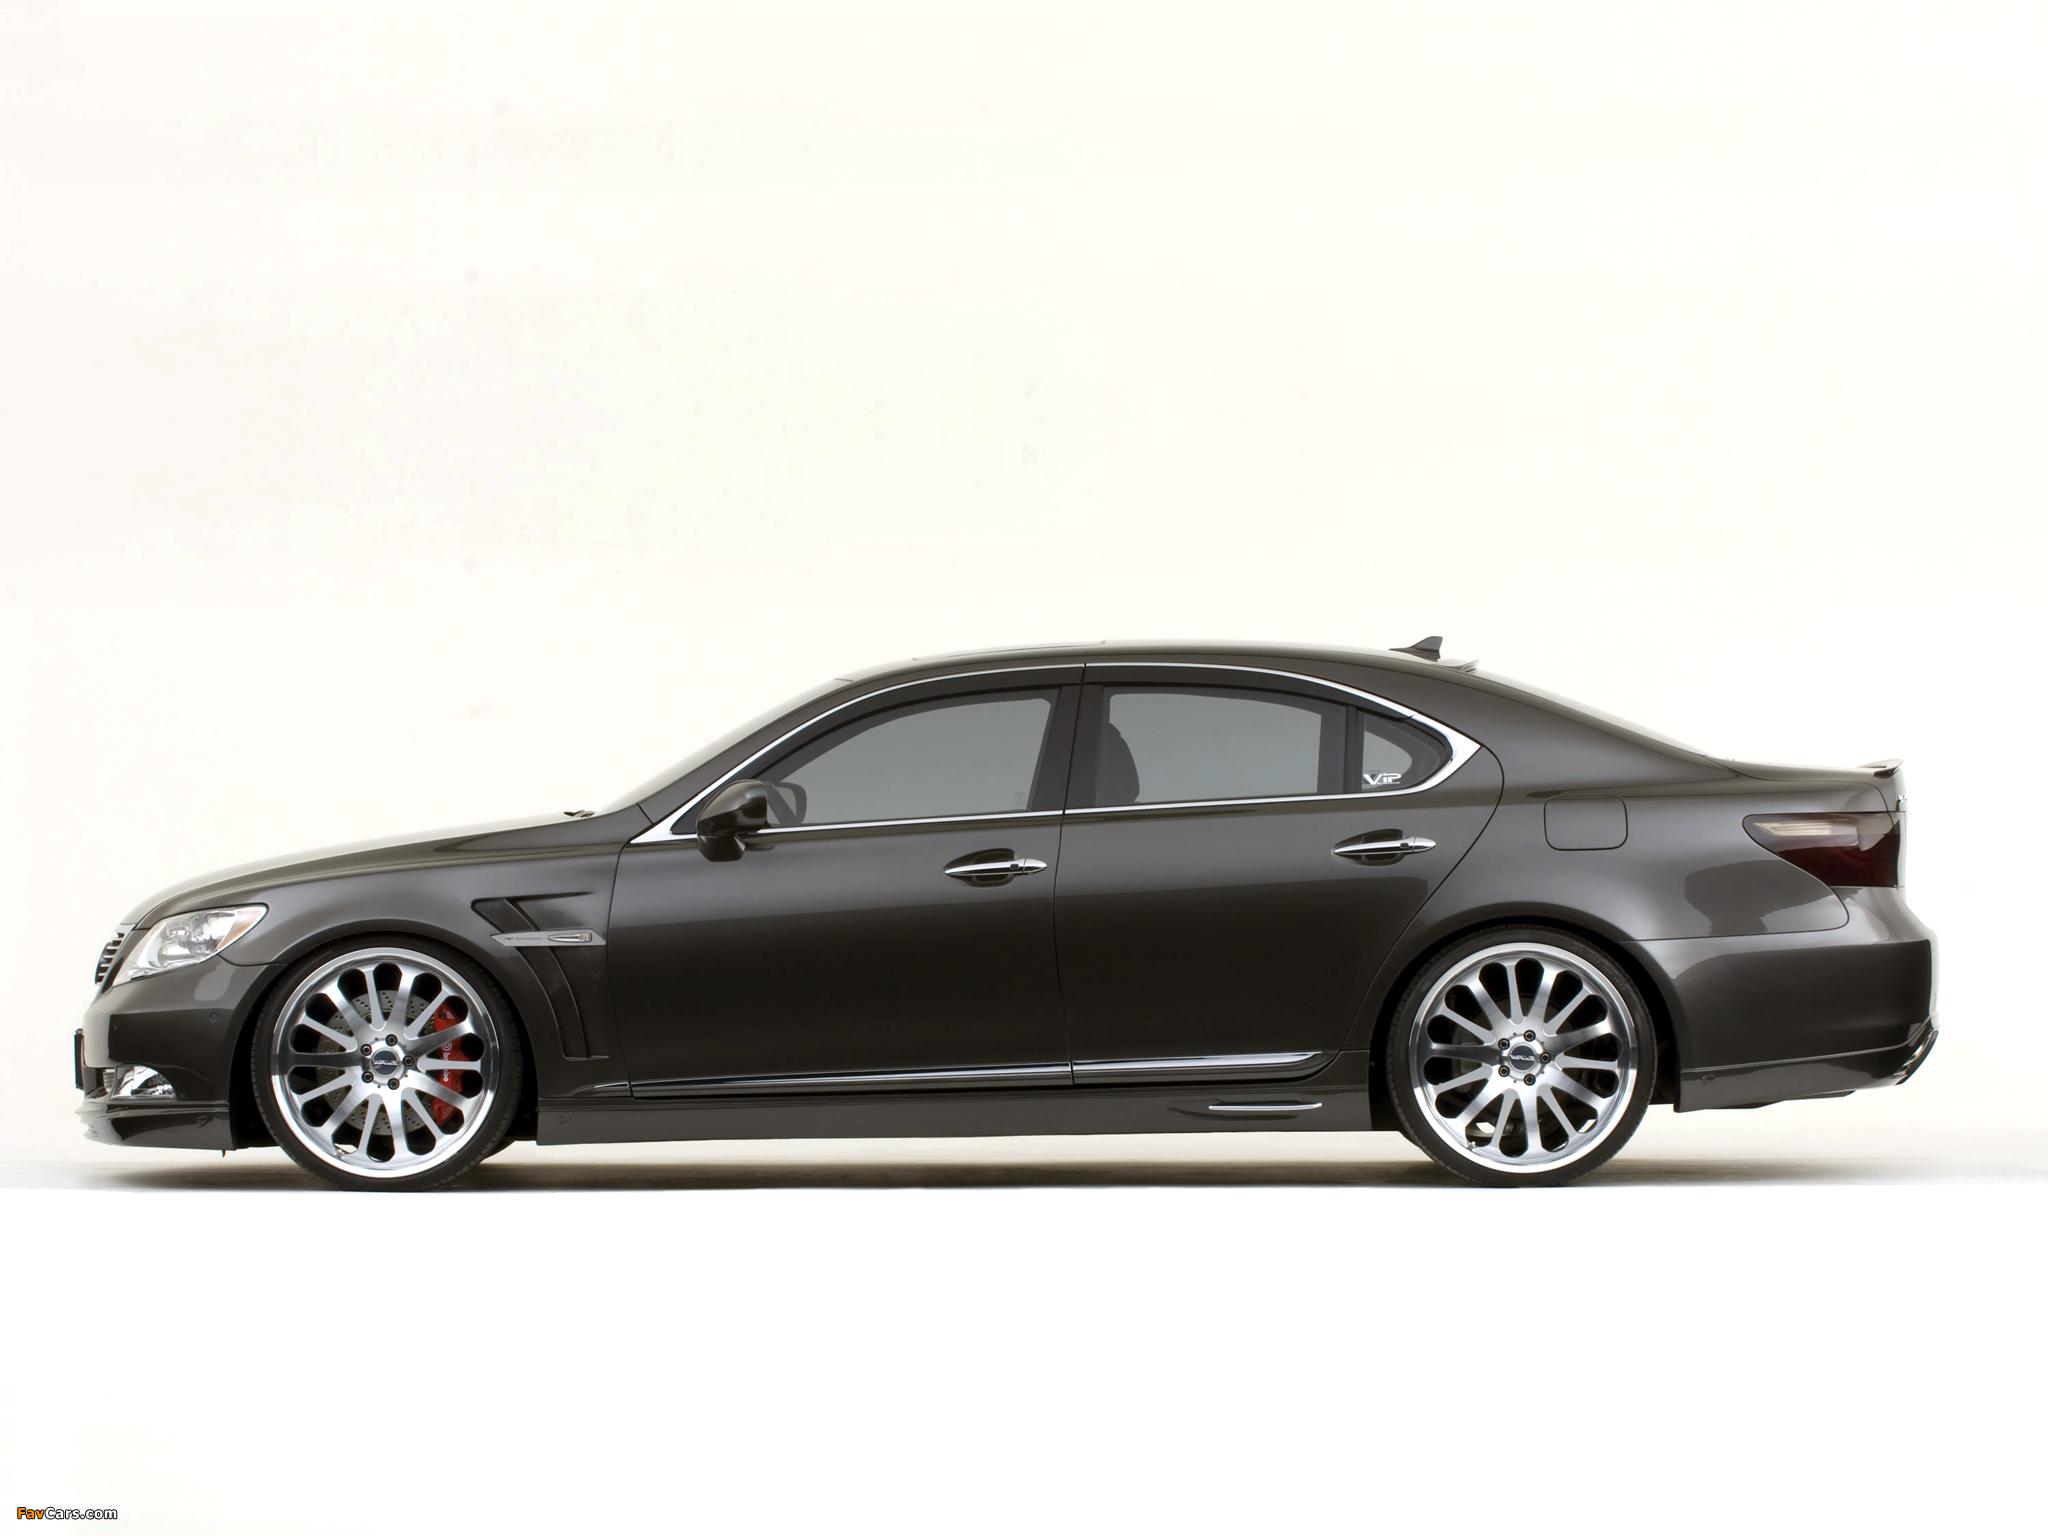 WALD Lexus LS 460 VIP (USF40) 2007 images (2048 x 1536)